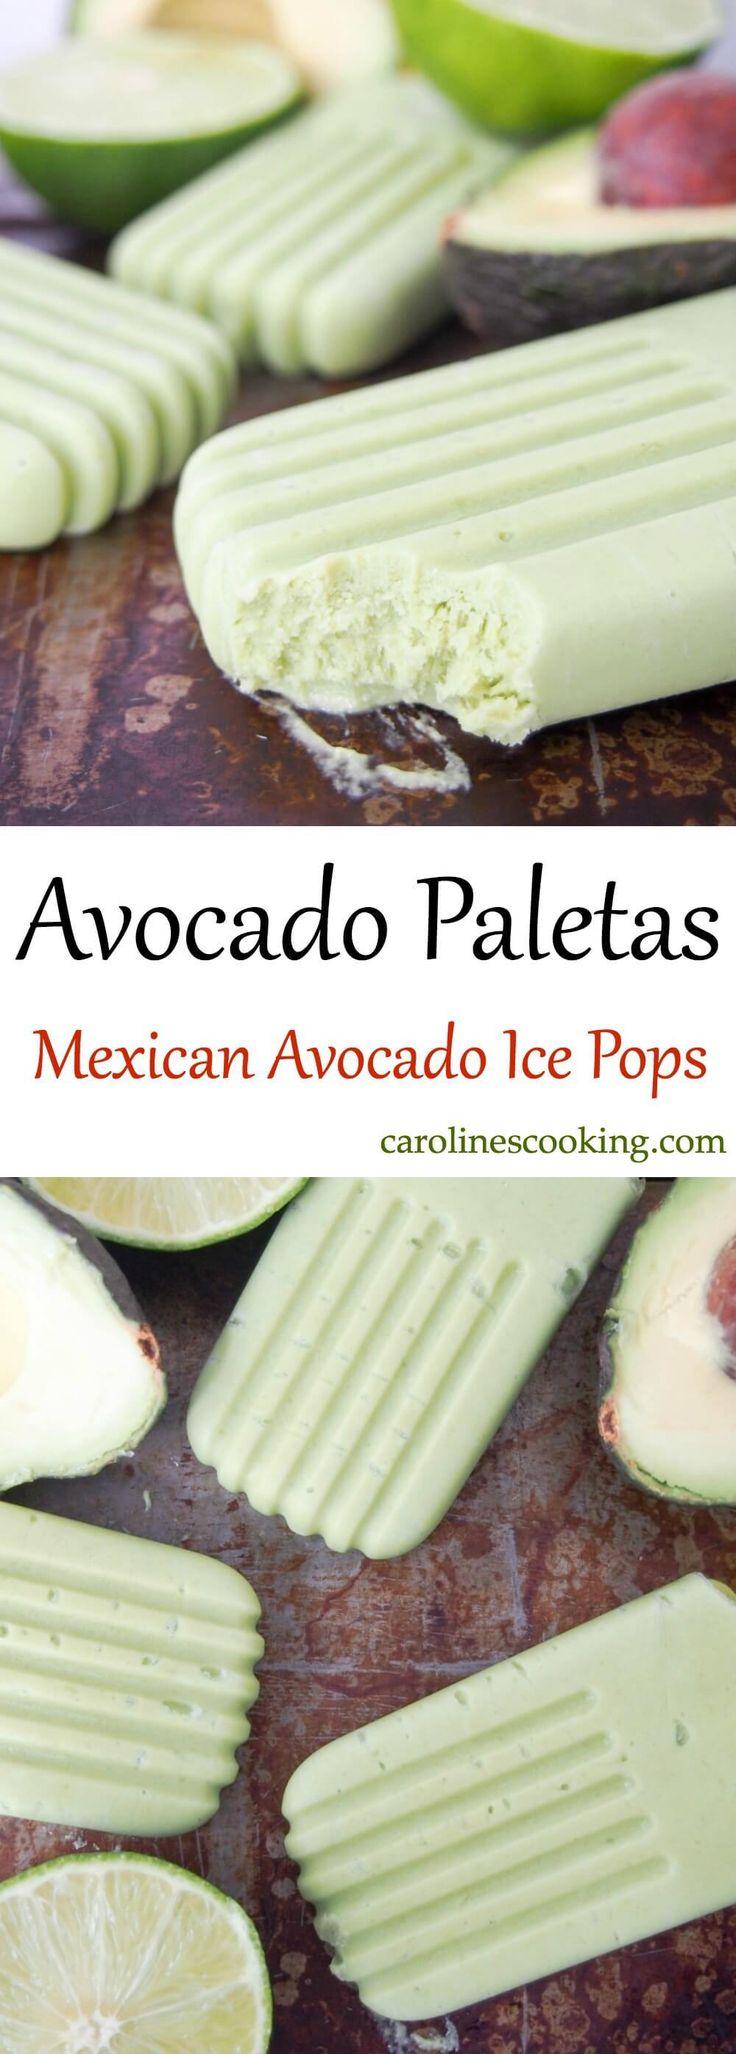 Avocado Paletas (mexican Avocado Ice Pops)